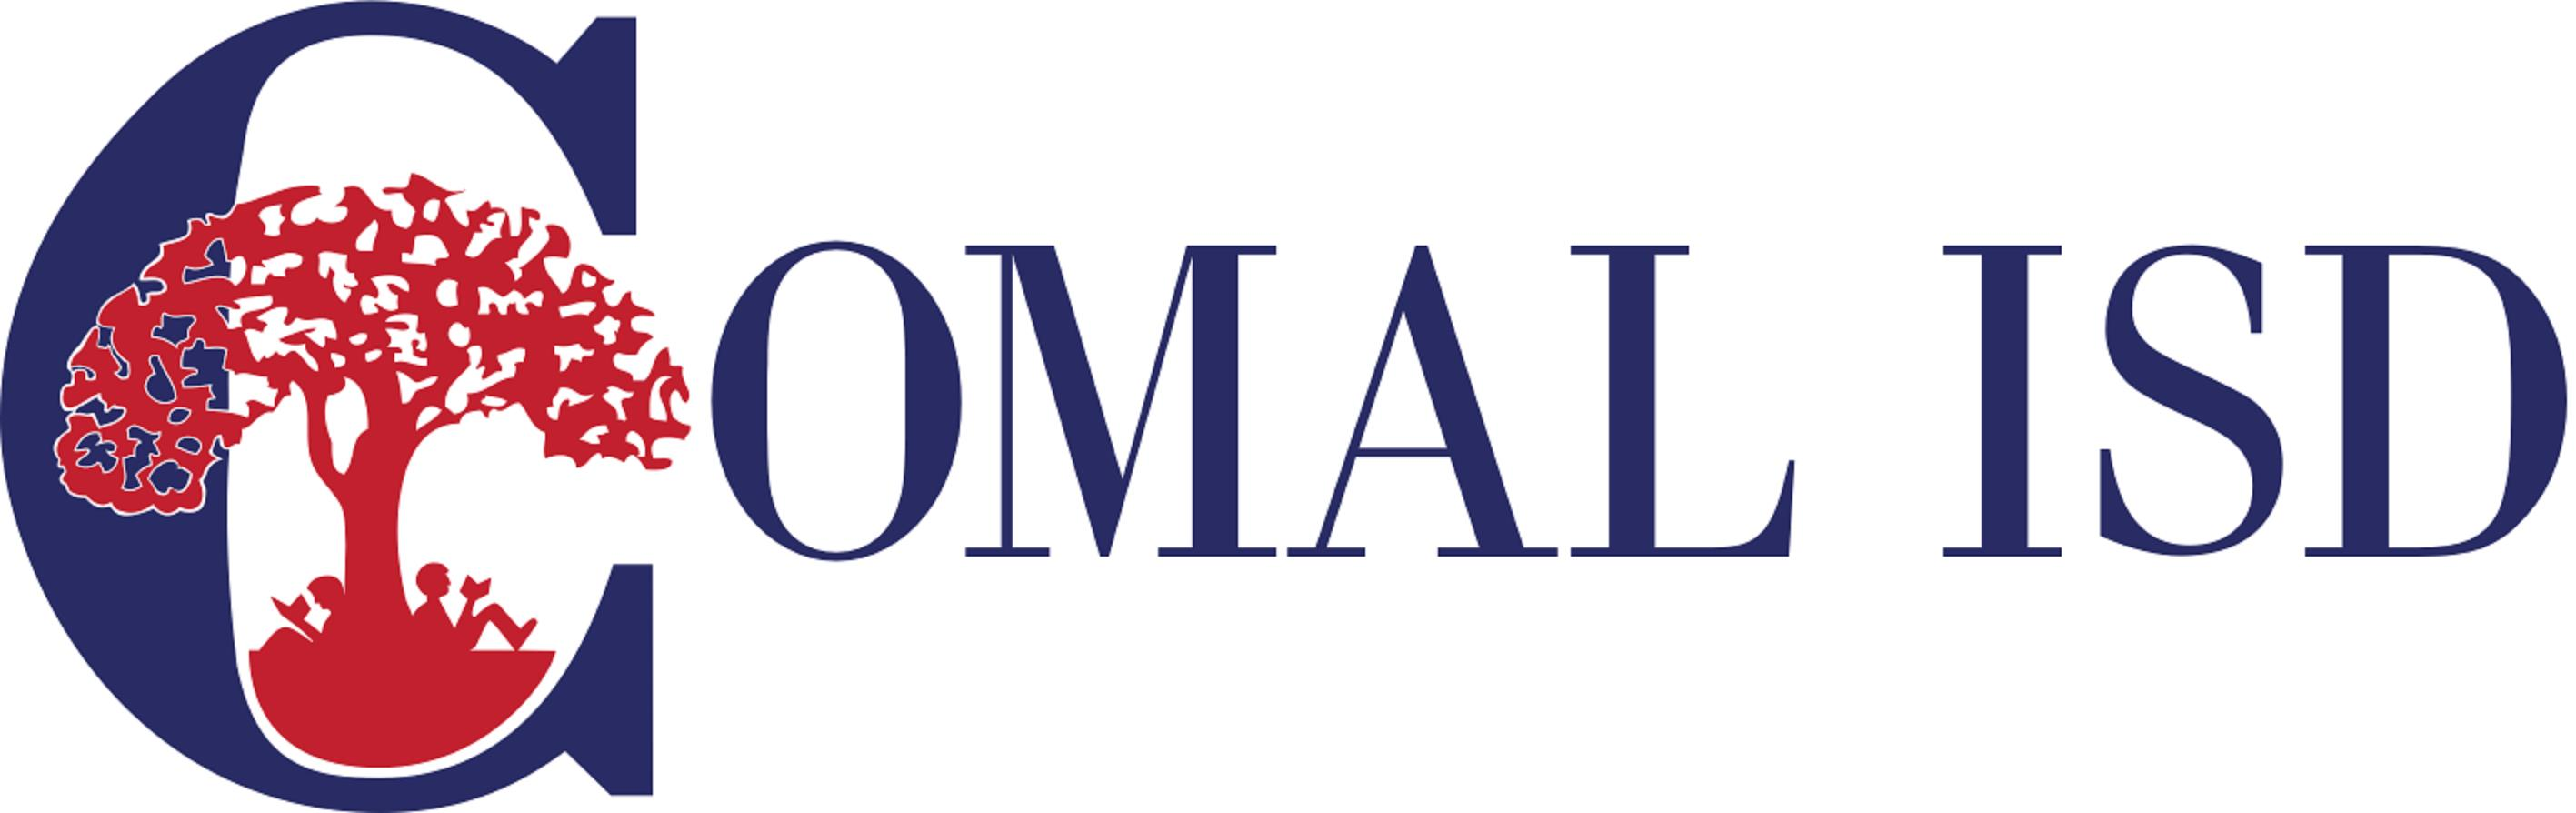 "Search Results for ""Comal Isd 2016 2016 Calendar"" – Calendar ..."